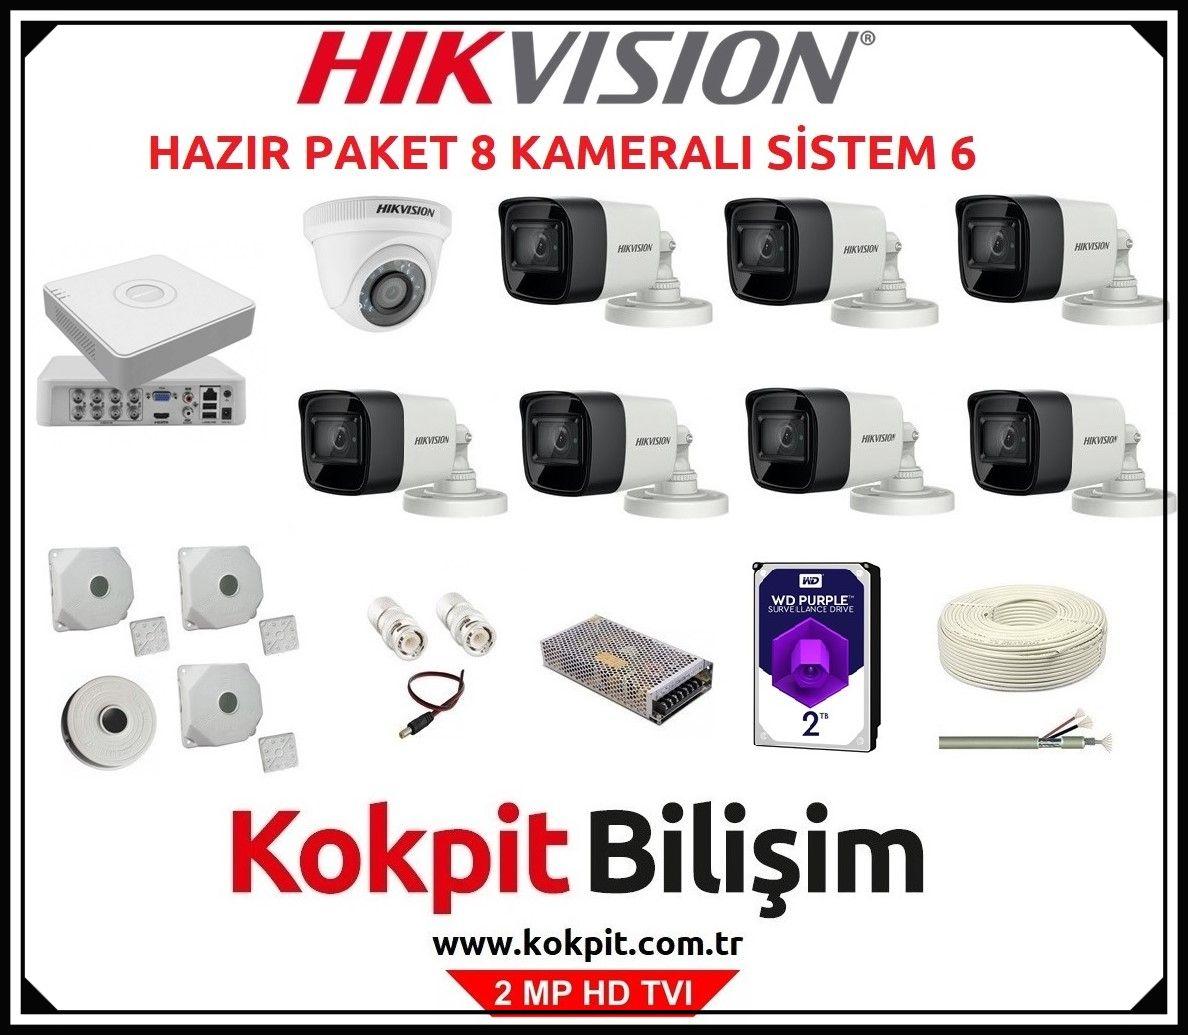 8 Kameralı HD TVI Güvenlik Kamera Sistemi 6